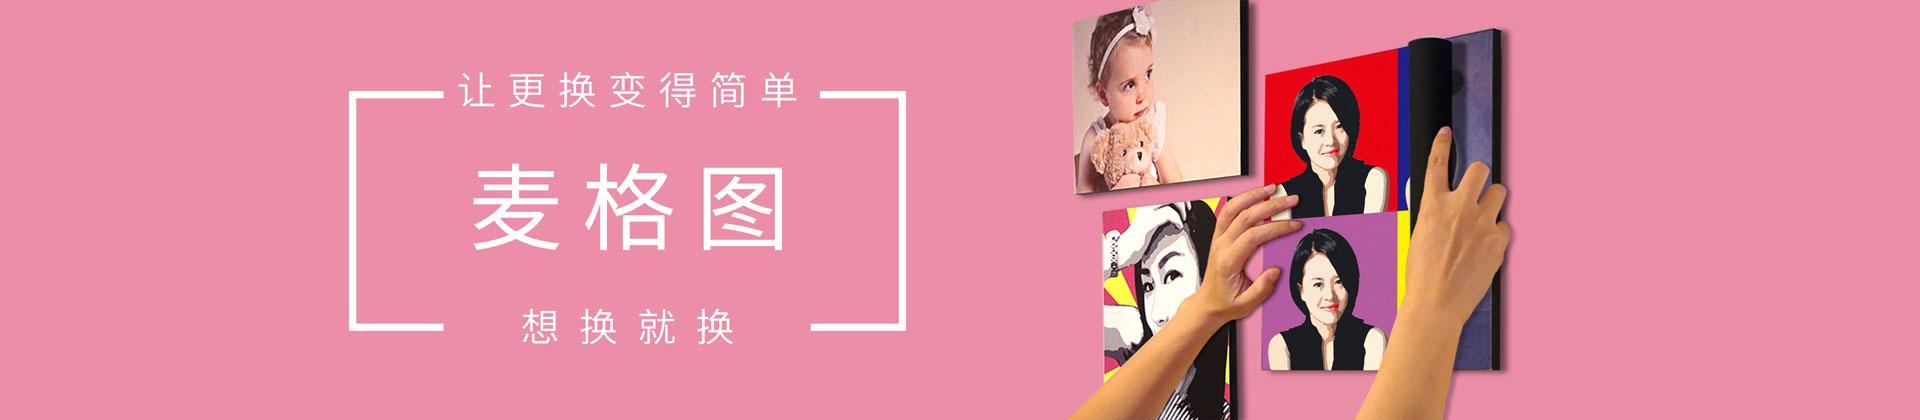 catalog/Sliders/MAGTOO/magtoo1920x420-CN.jpg